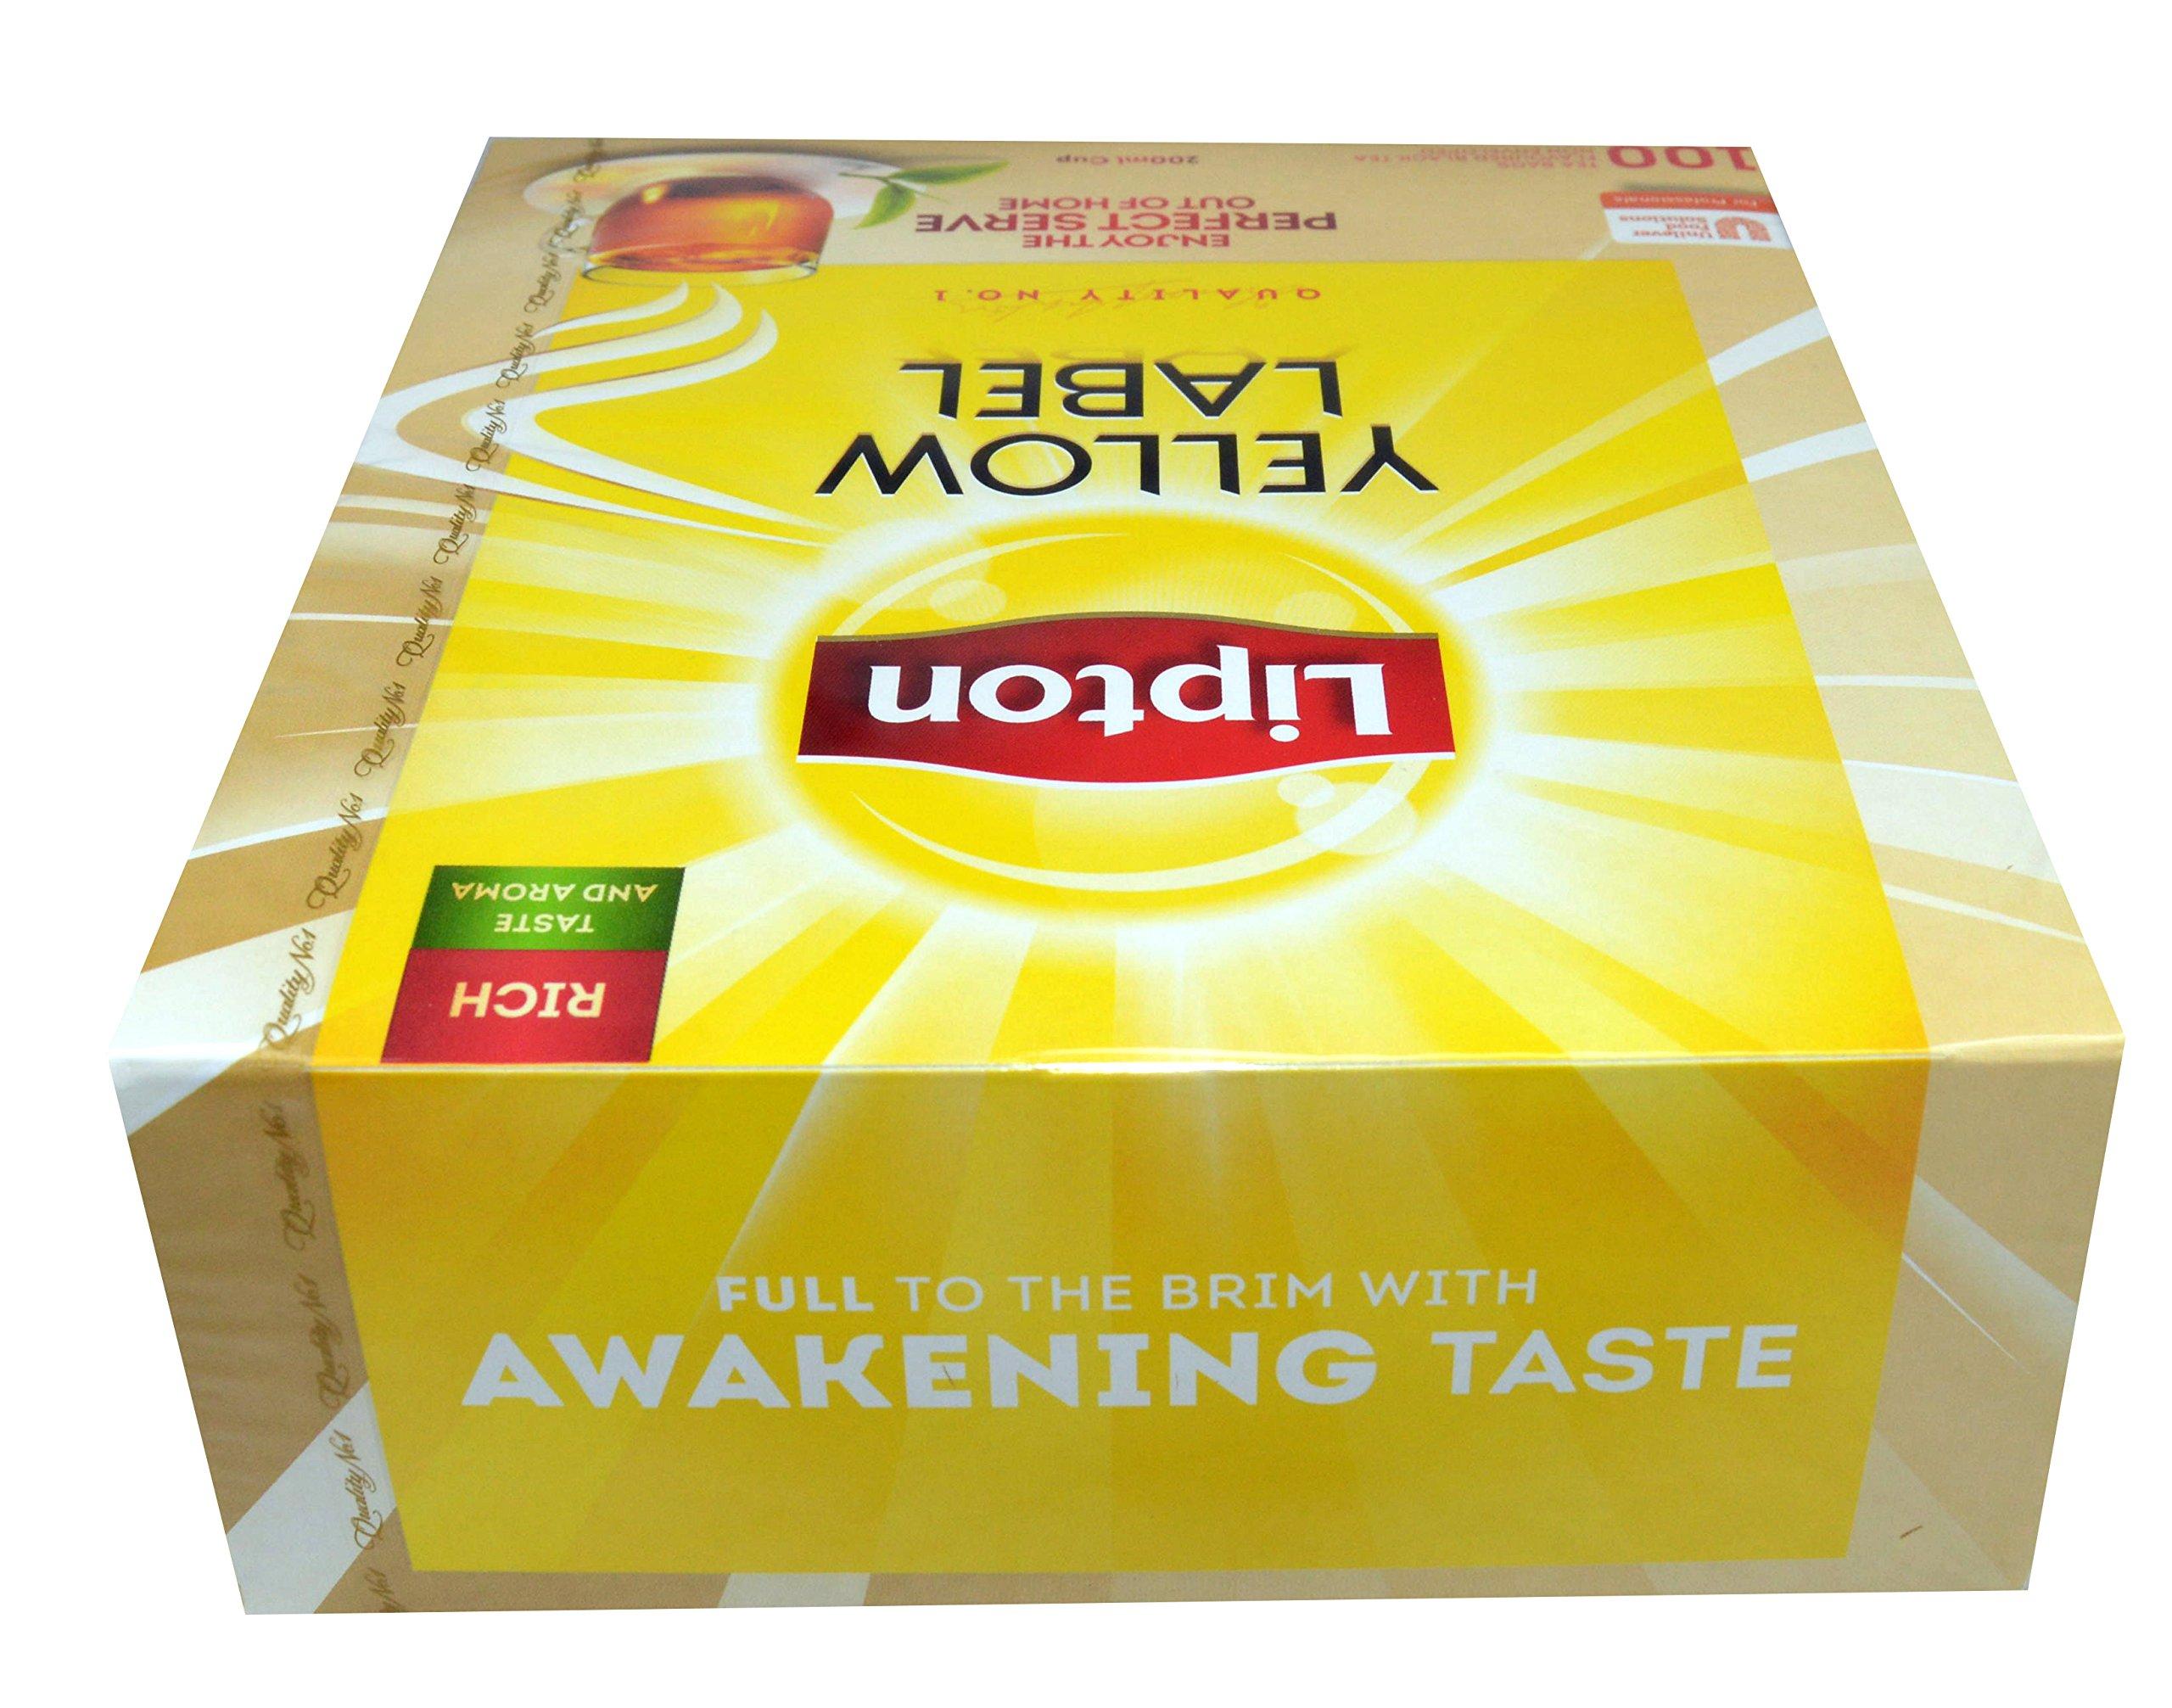 200-Teebeutel-Lipton-Yellow-Label-Tea-Quality-No-1-2-x-100